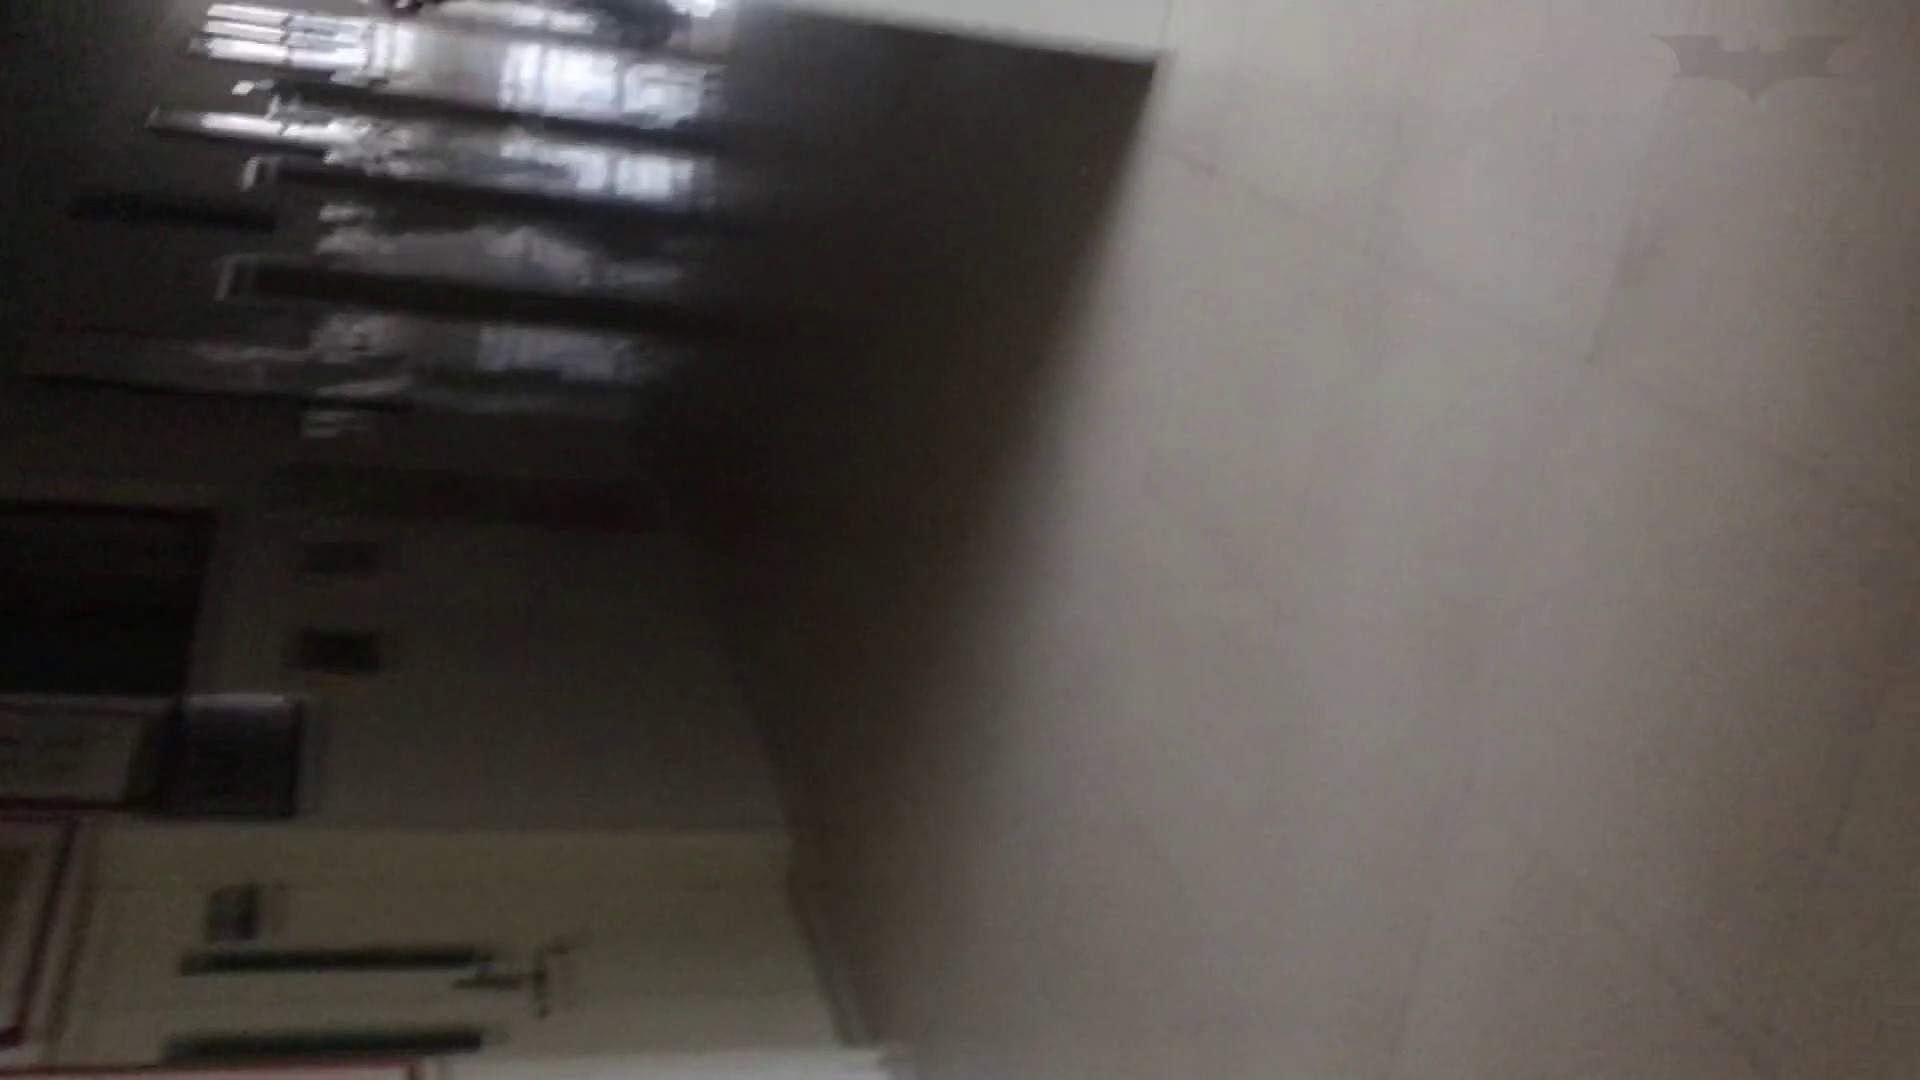 芸術大学ガチ潜入盗撮 JD盗撮 美女の洗面所の秘密 Vol.80 盛合せ  79PIX 61